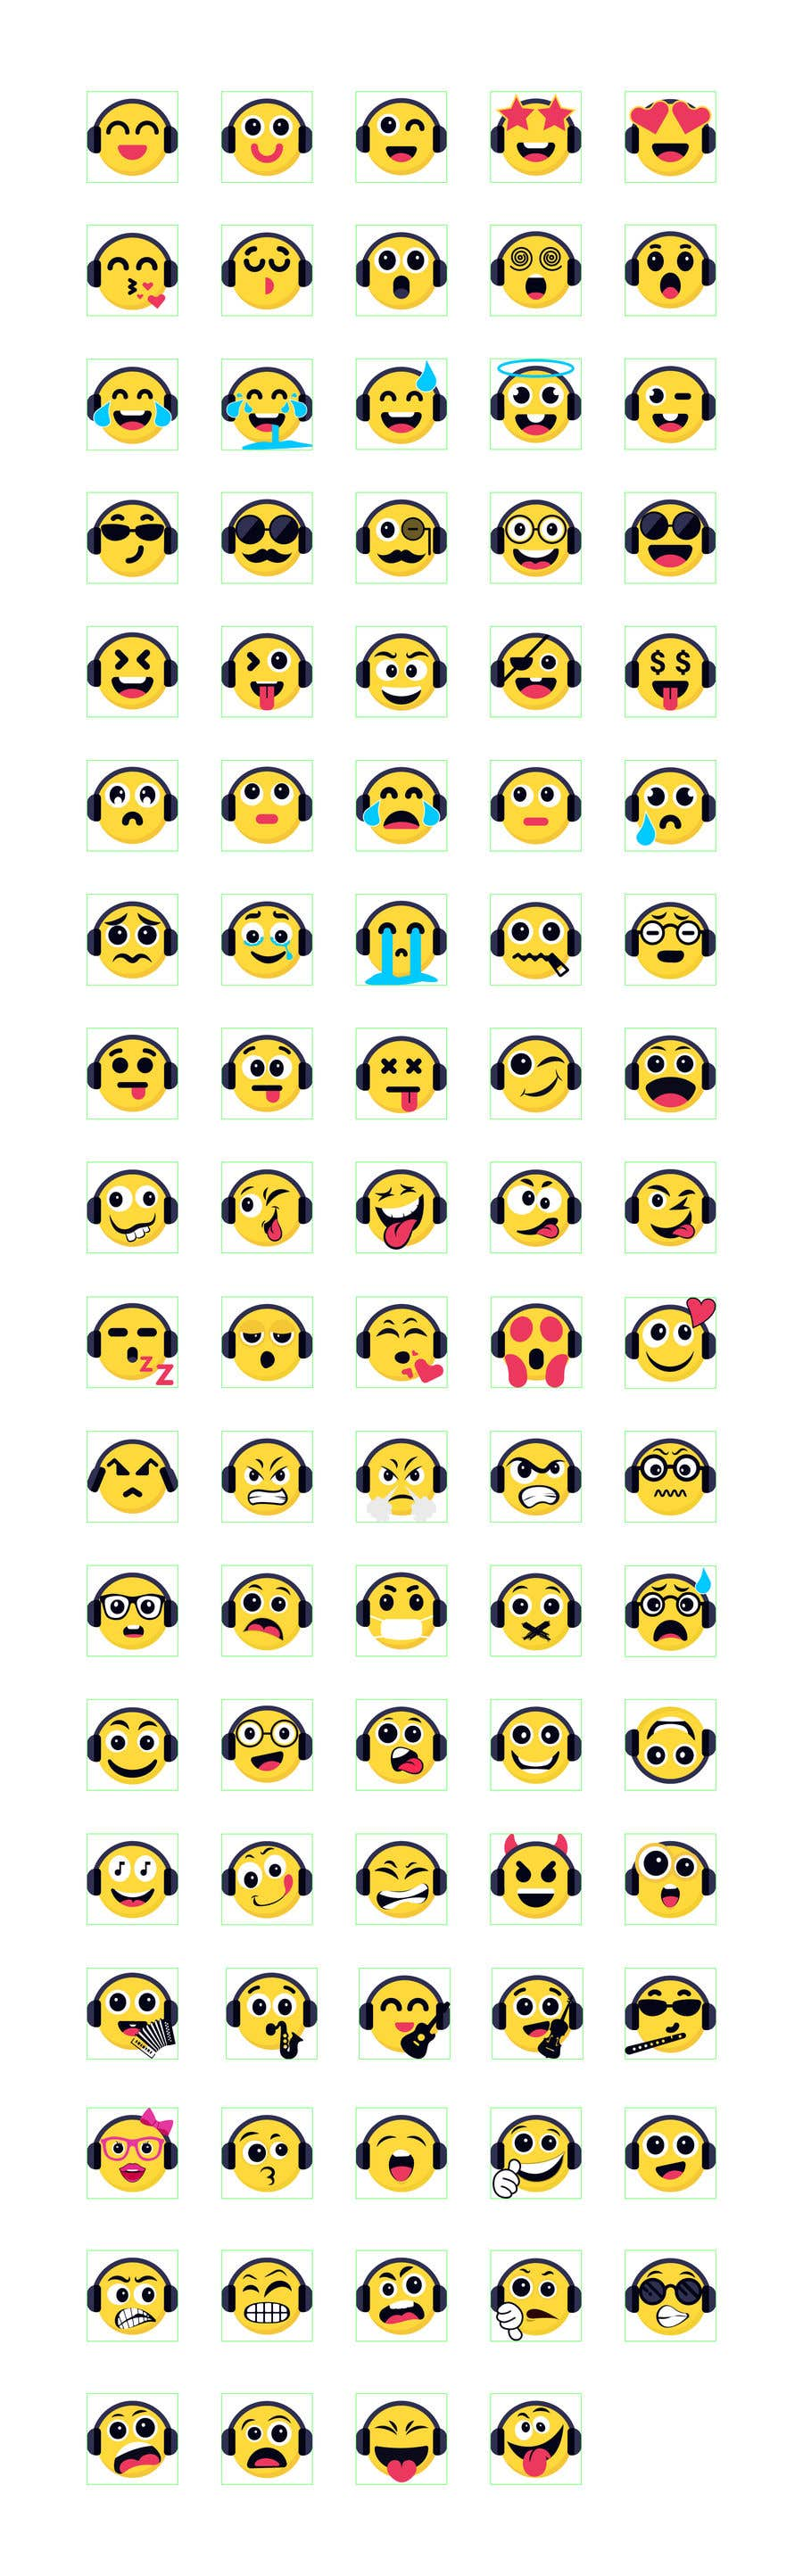 Bài tham dự cuộc thi #                                        197                                      cho                                         Design custom emojis for a YouTube-channel's membership program